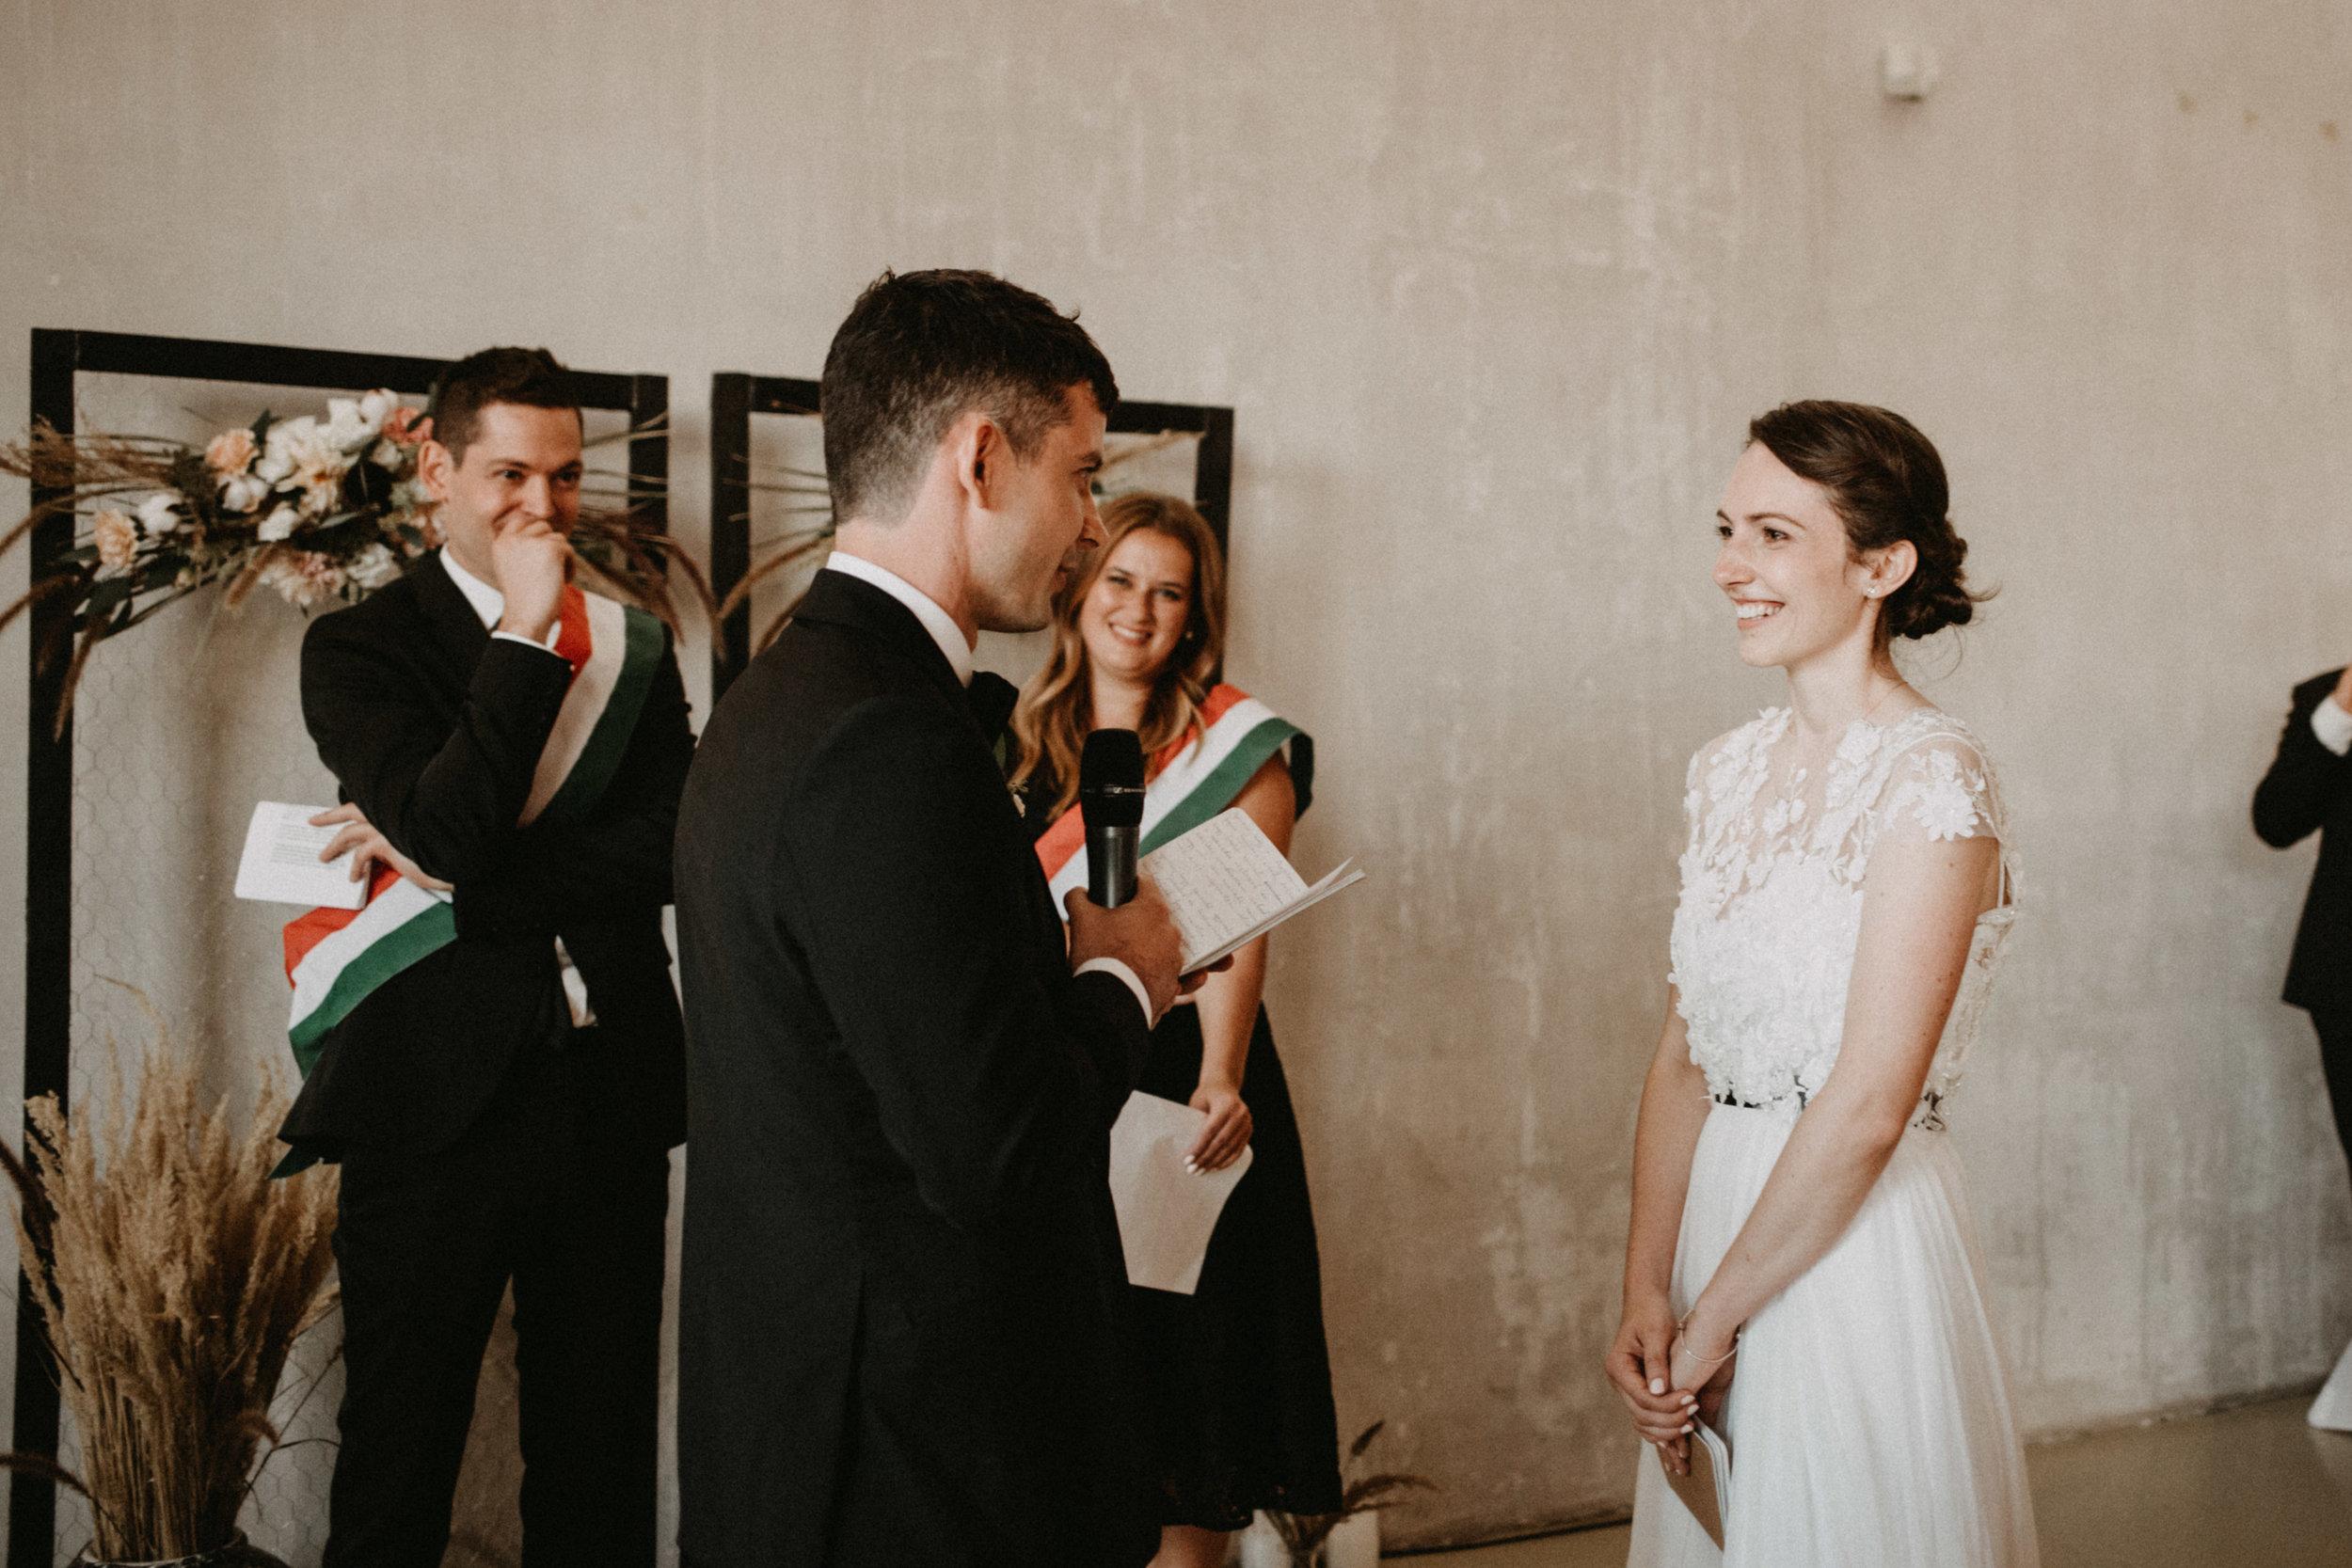 1826-Moni+Szabi-wedding-396-w.jpg